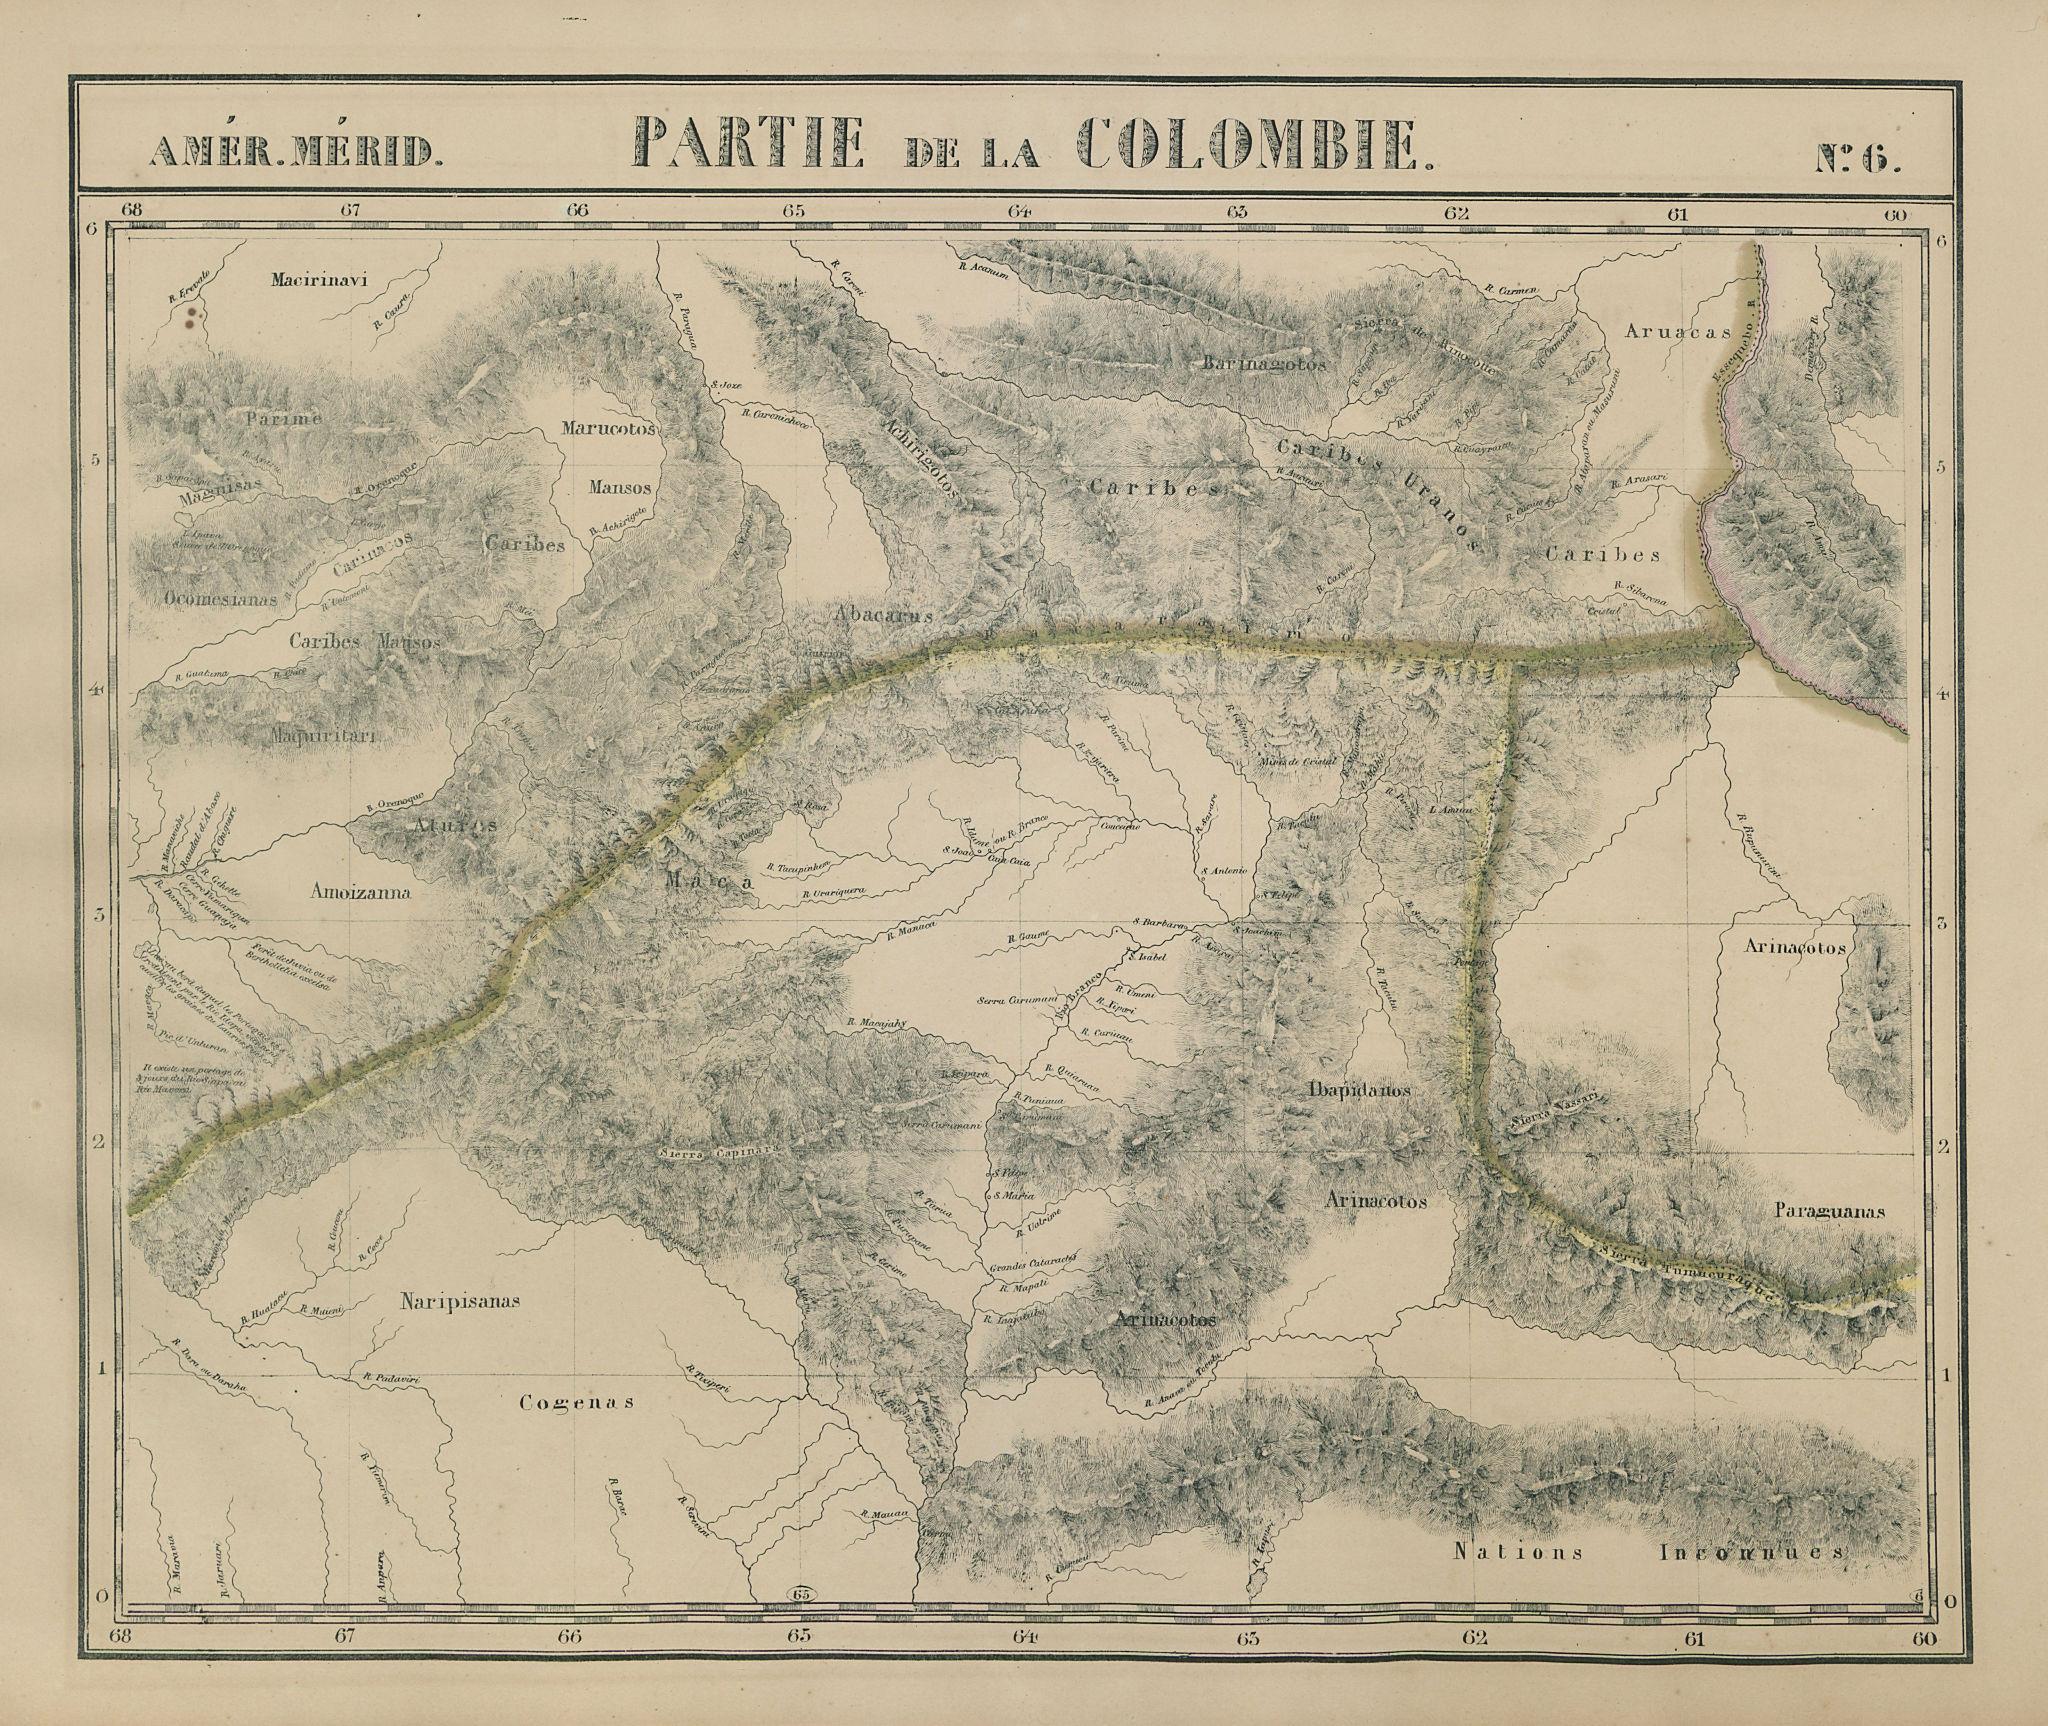 Amér Mér. Colombie #6 Venezuela Guyana. North Brazil AM RR VANDERMAELEN 1827 map